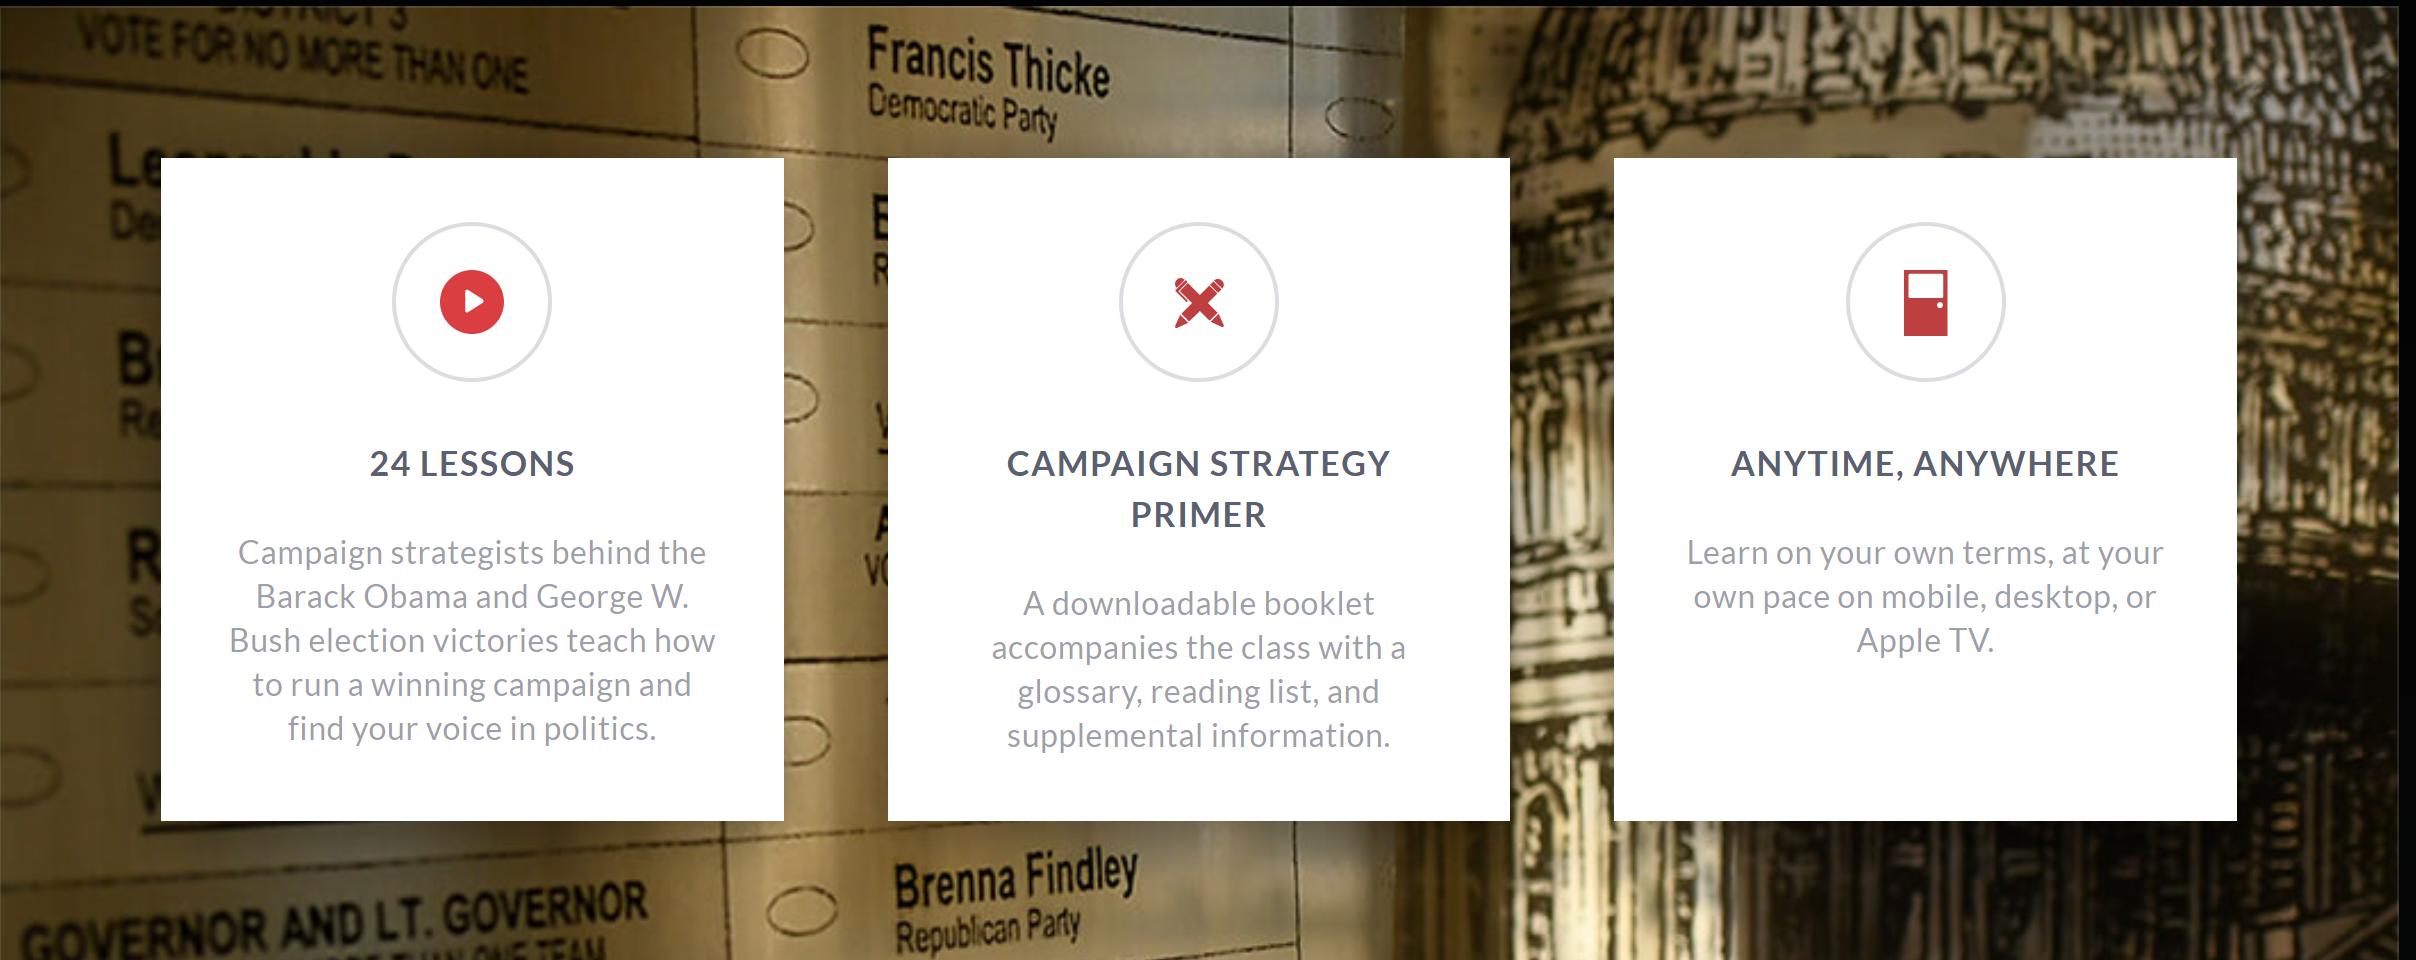 David Axelrod teaches campaign strategy masterclass